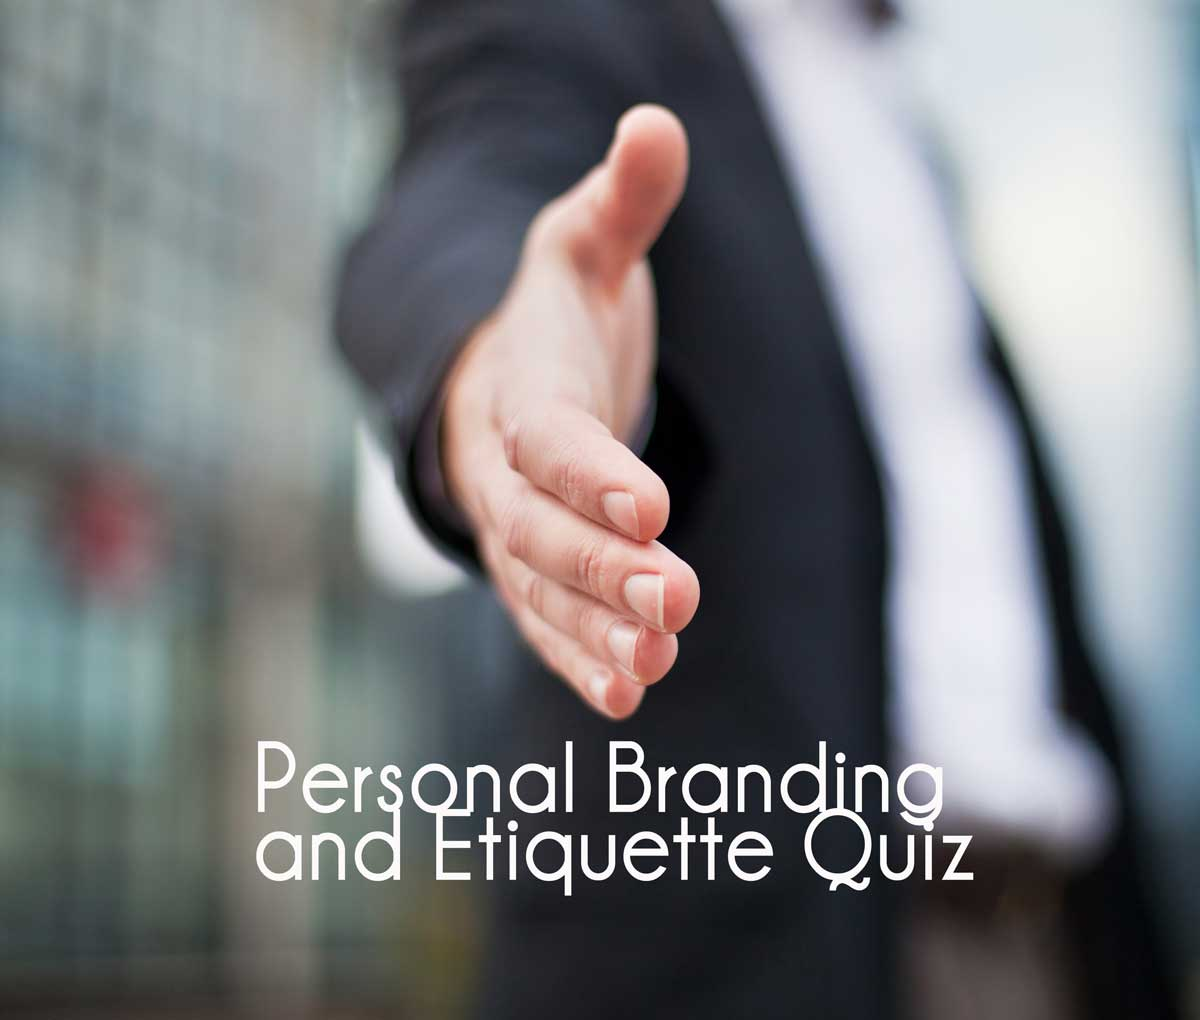 Personal Branding and Etiquette Quiz